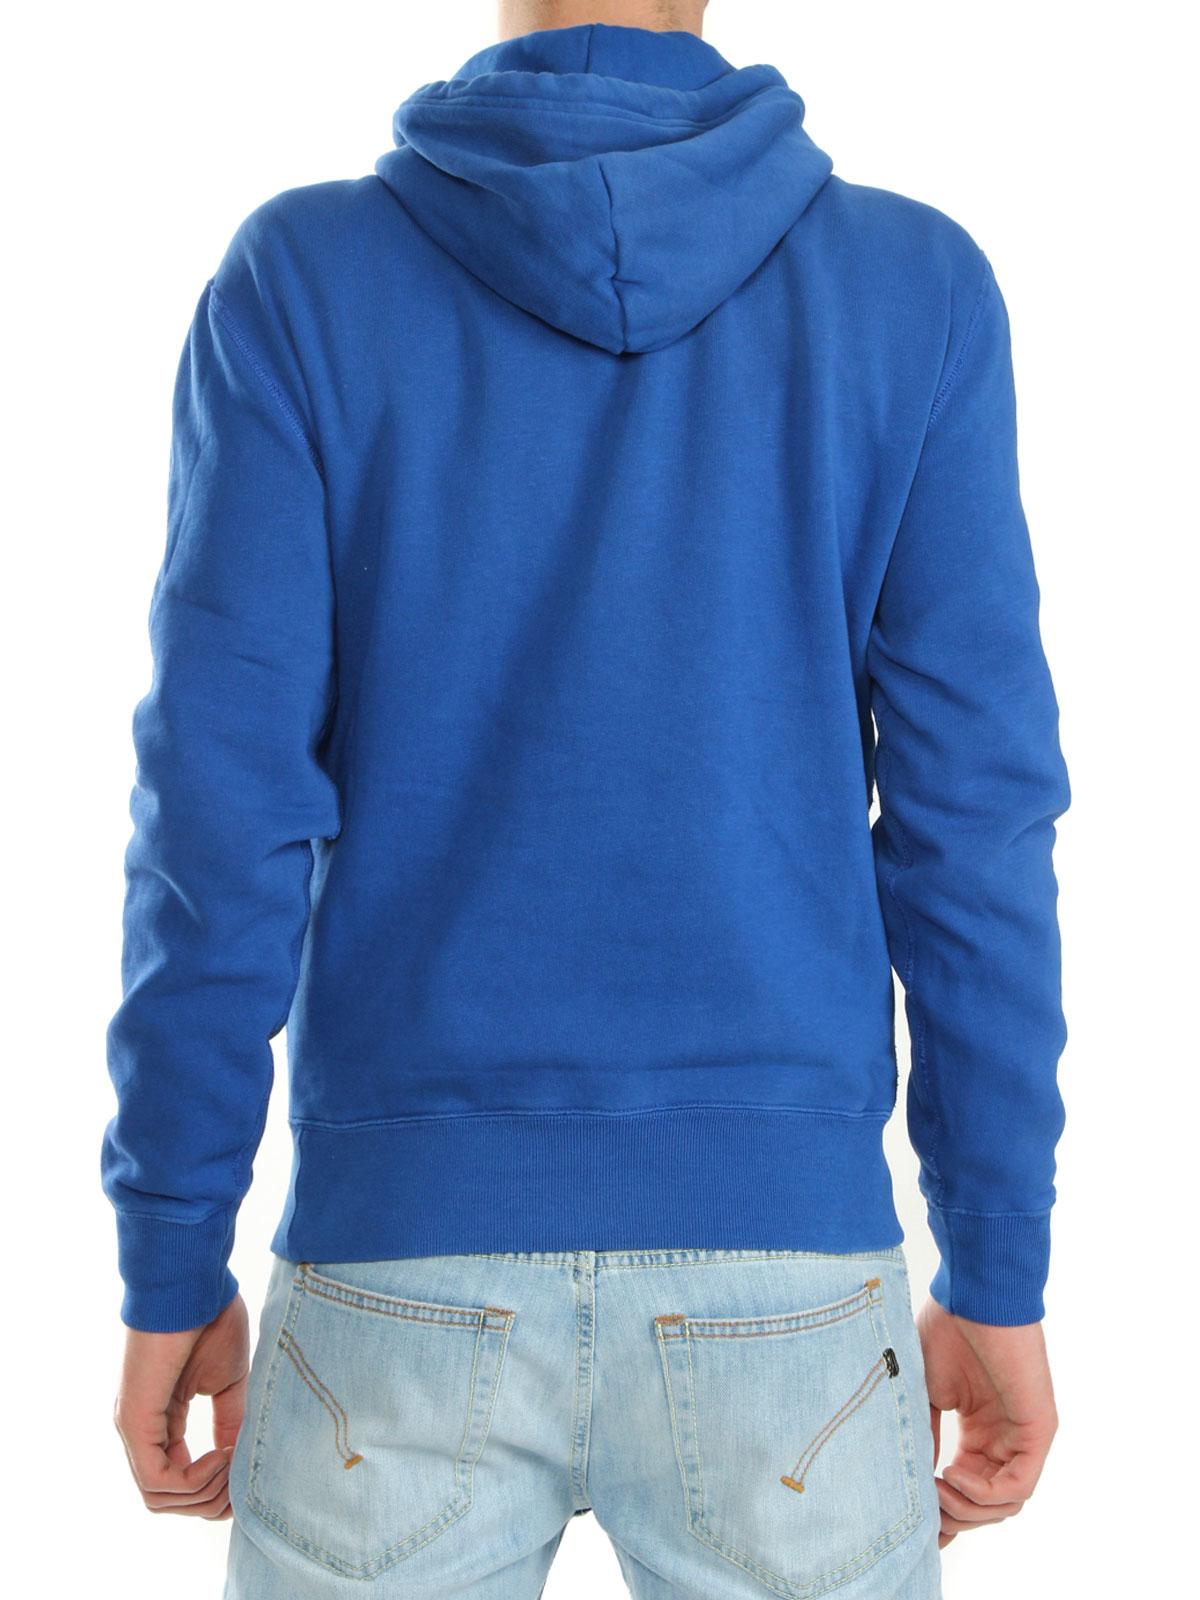 polo ralph lauren sweatshirt in blue for men lyst. Black Bedroom Furniture Sets. Home Design Ideas